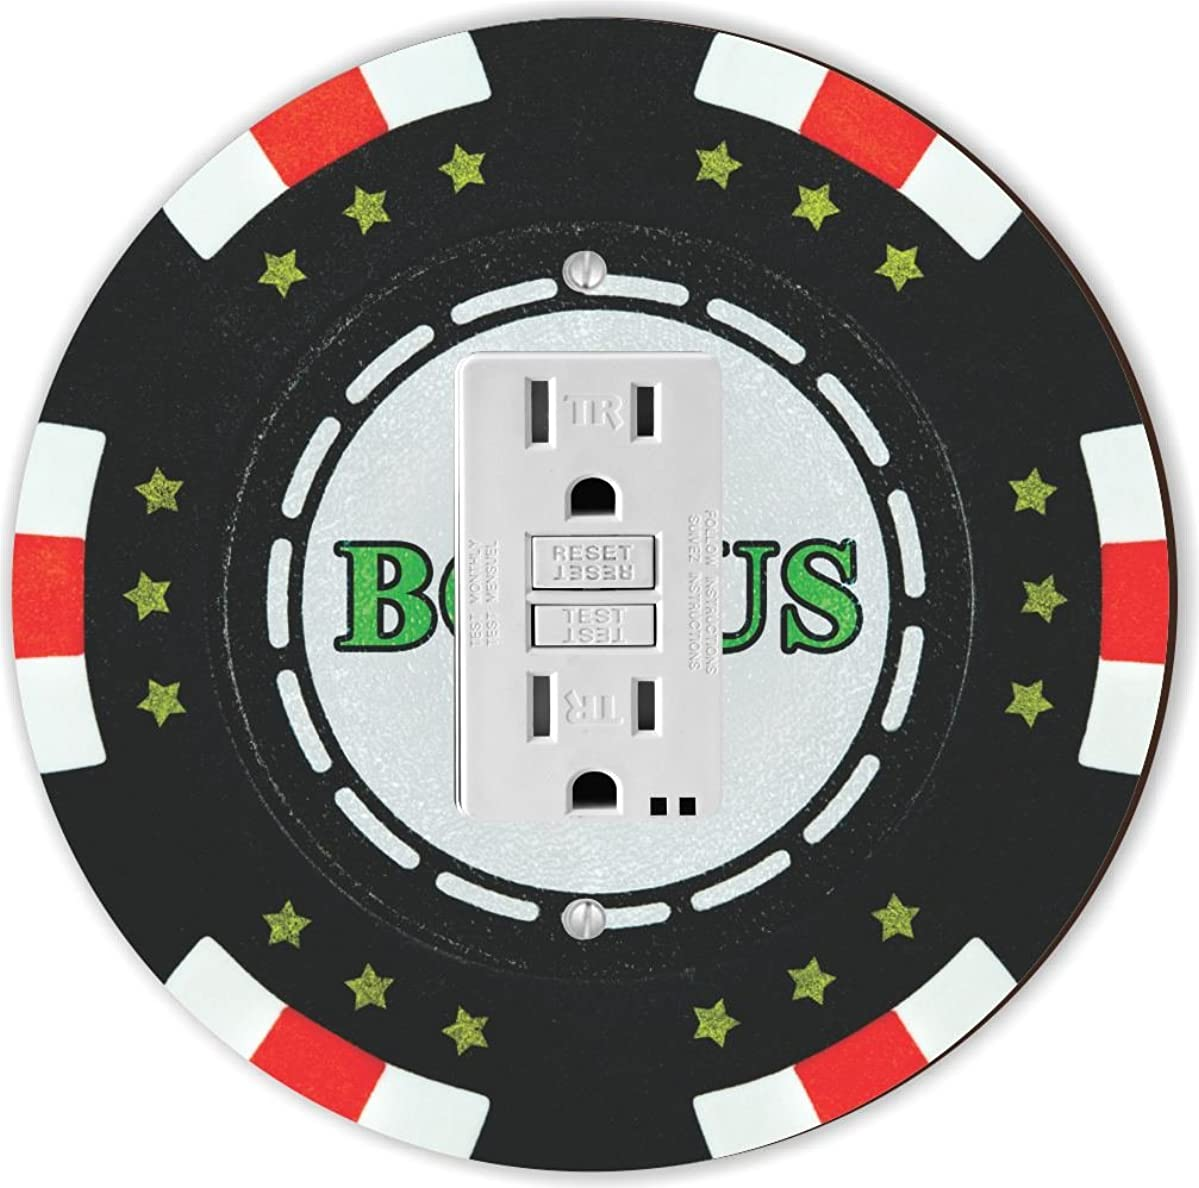 Rikki Knight RND-GFISINGLE-102 Bonus Poker Chip Round Single GFI Light Switch Plate